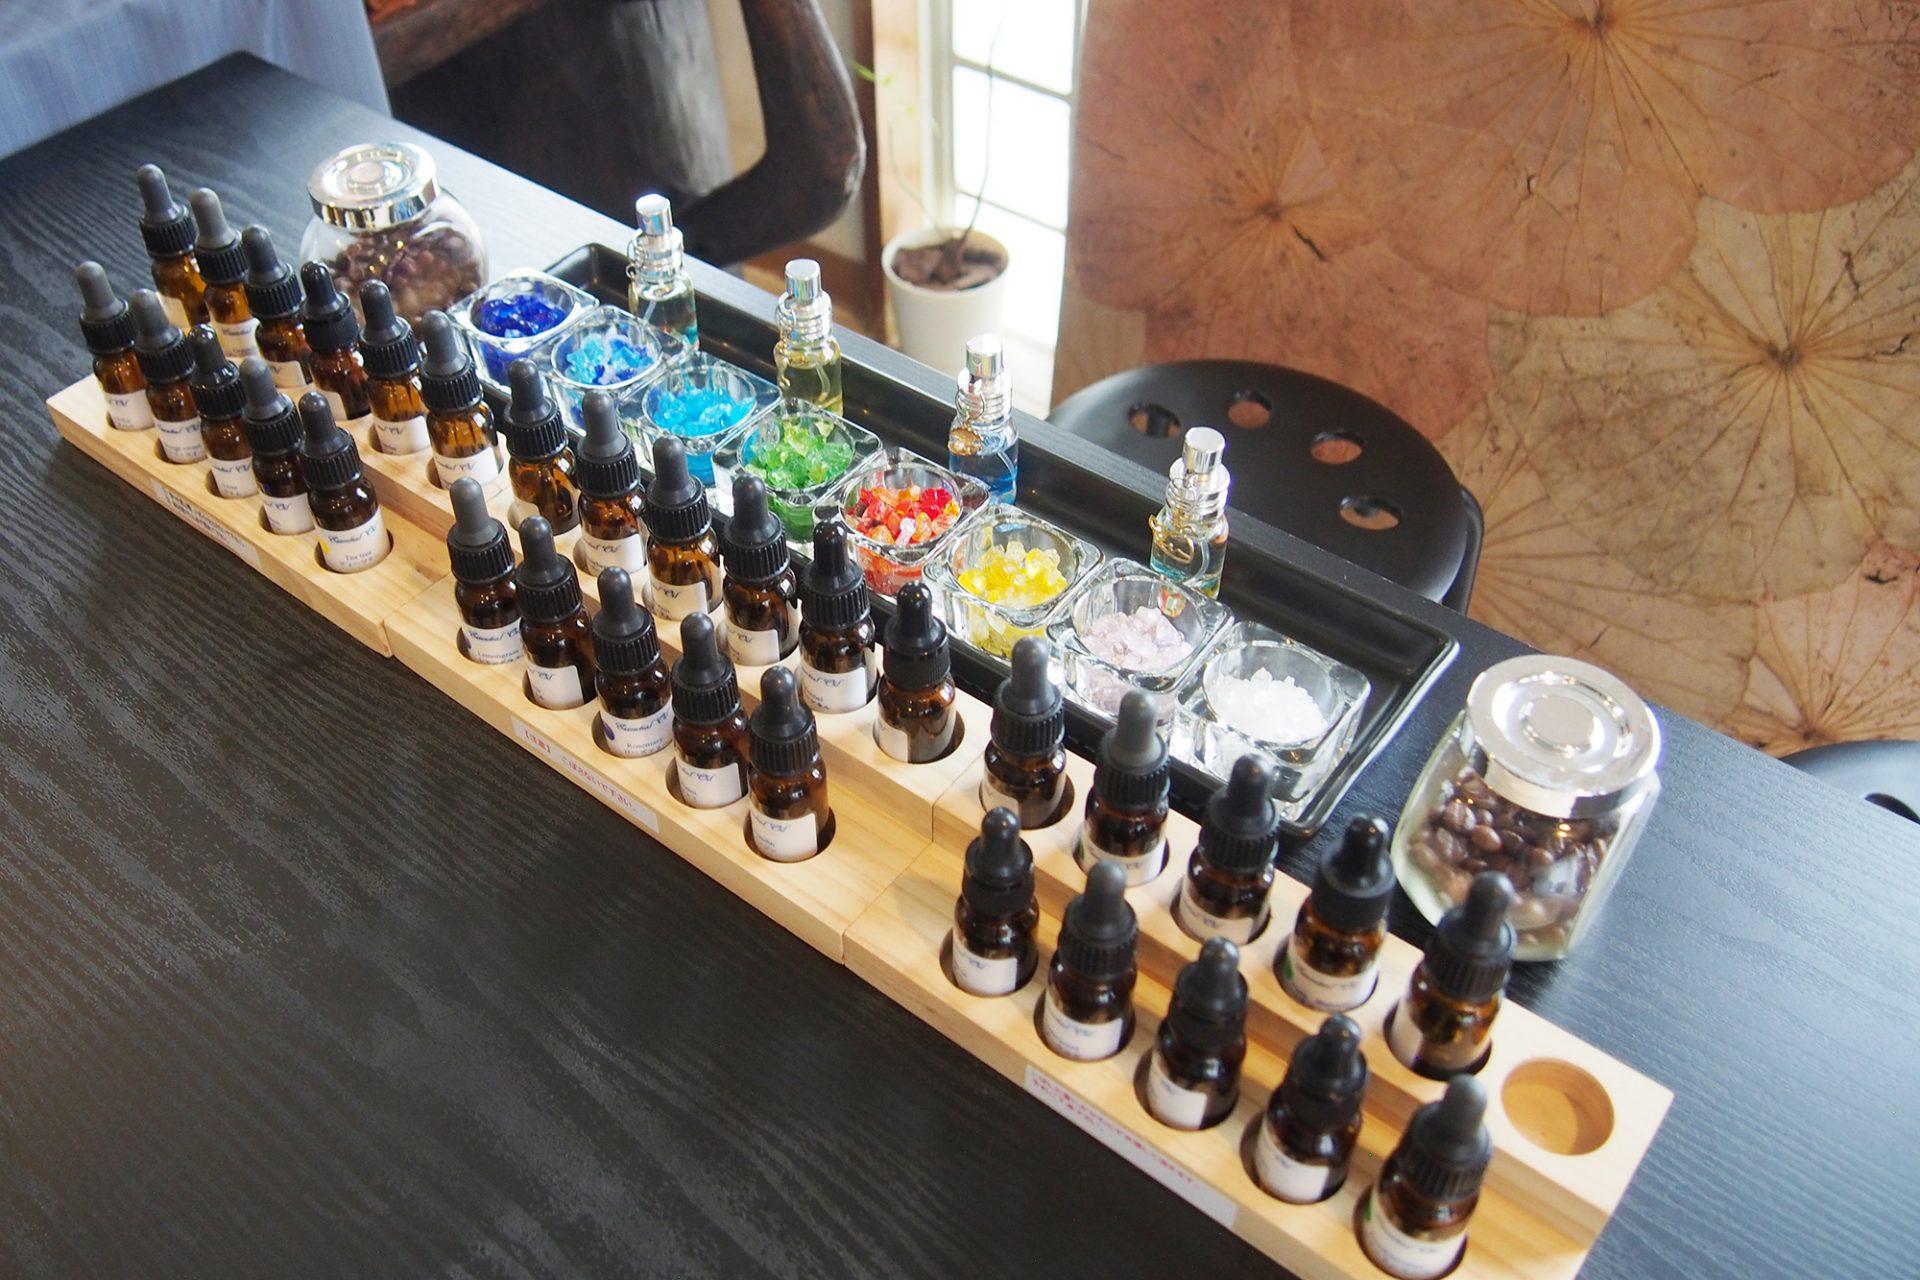 琉球香水作り体験